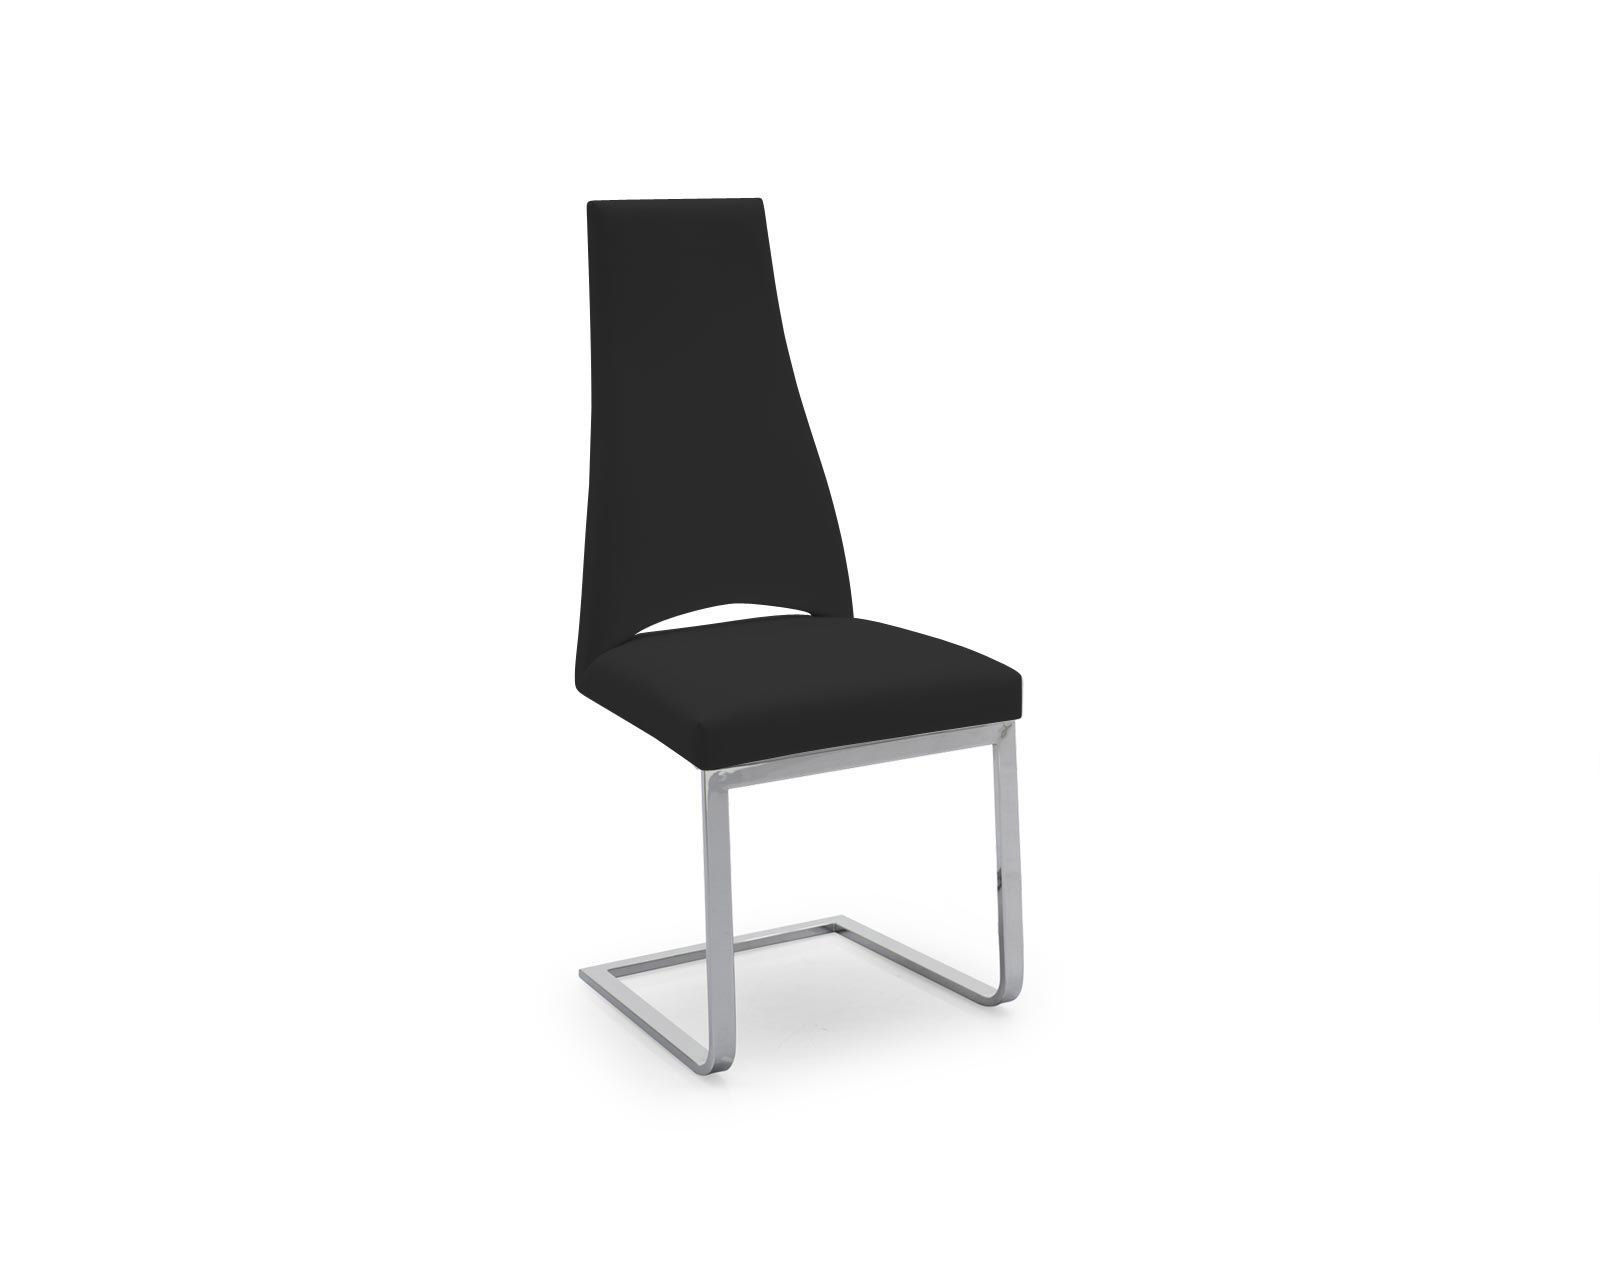 sedie salotto calligaris: sedie pieghevoli in legno plastica e ... - Sedie Cucina Scontate Calligaris